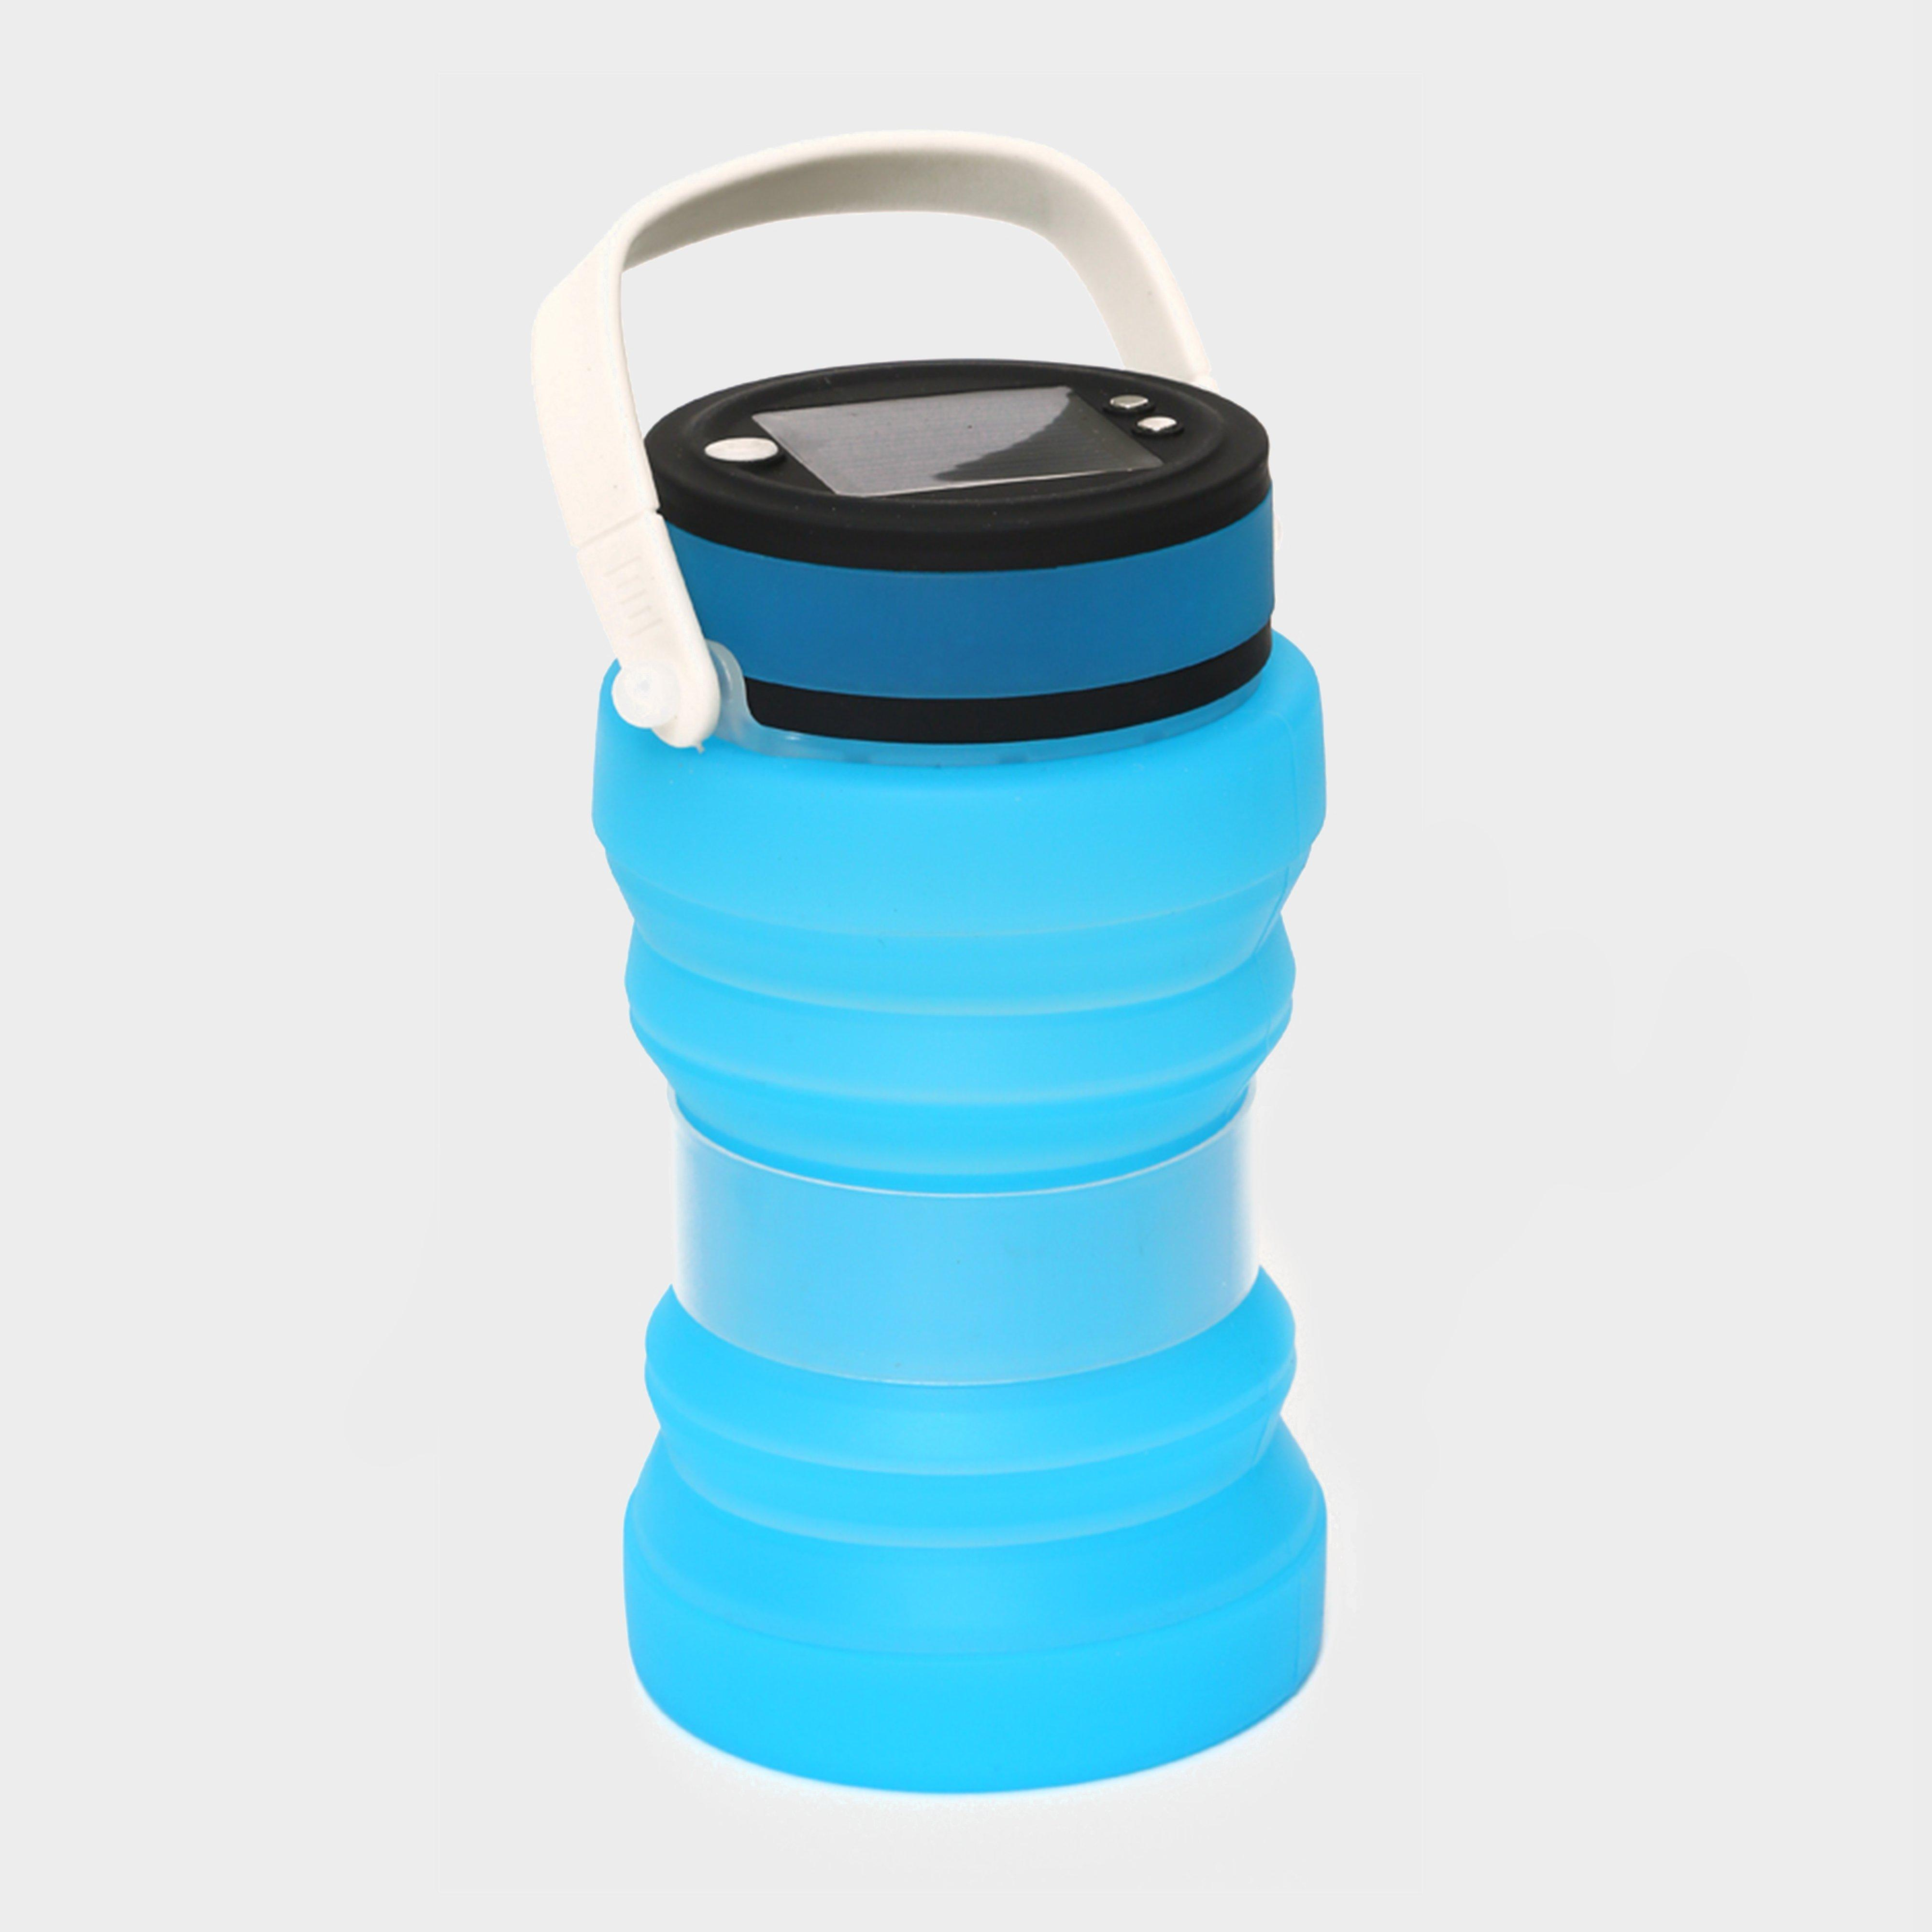 Hi-Gear Hi-Gear Collapsible Silicone Solar Lantern